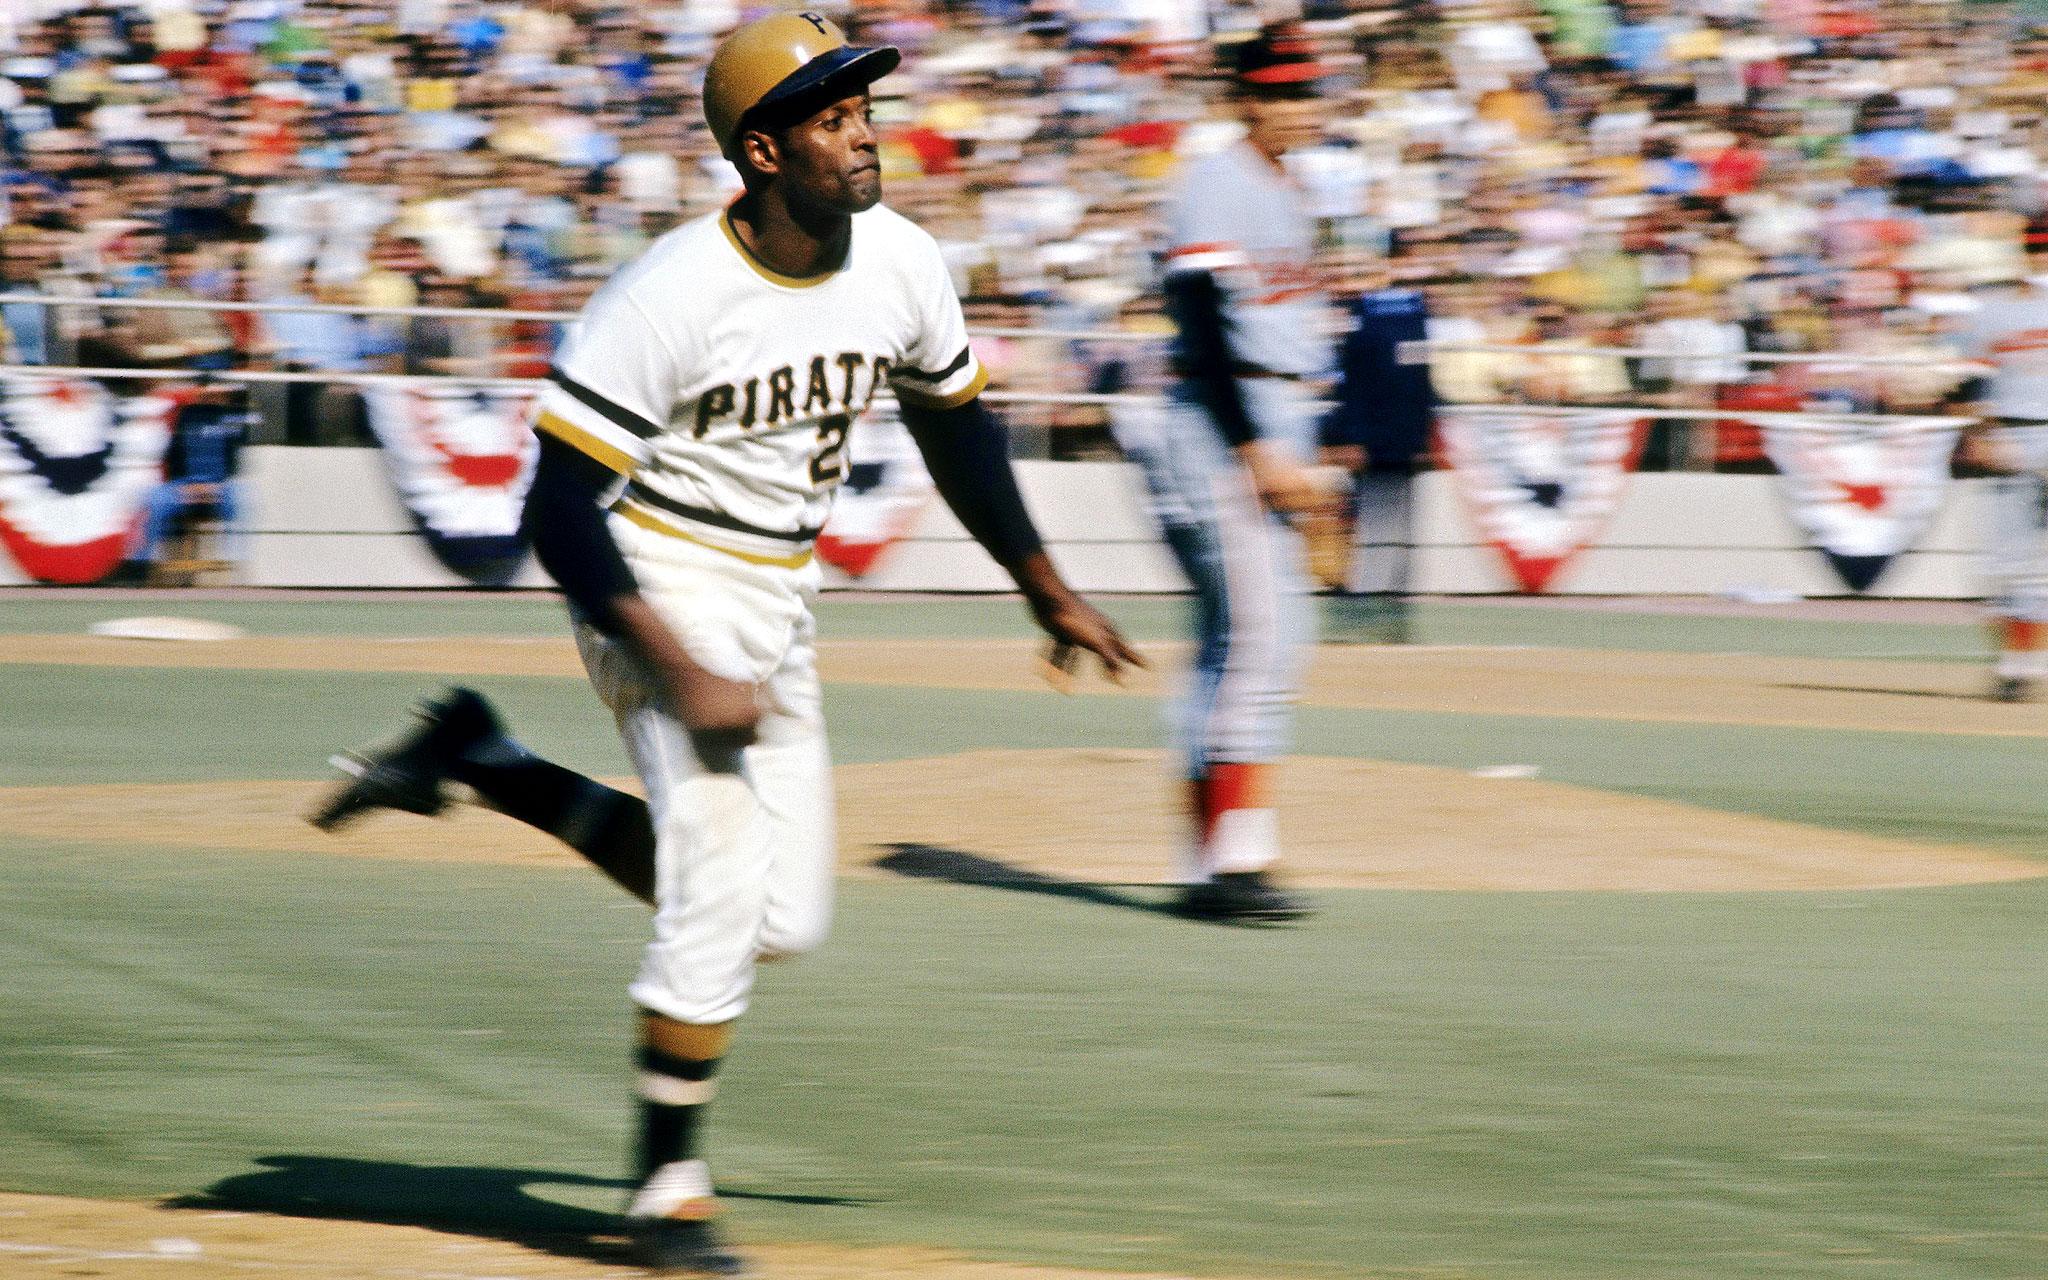 Clemente 1971 World Series